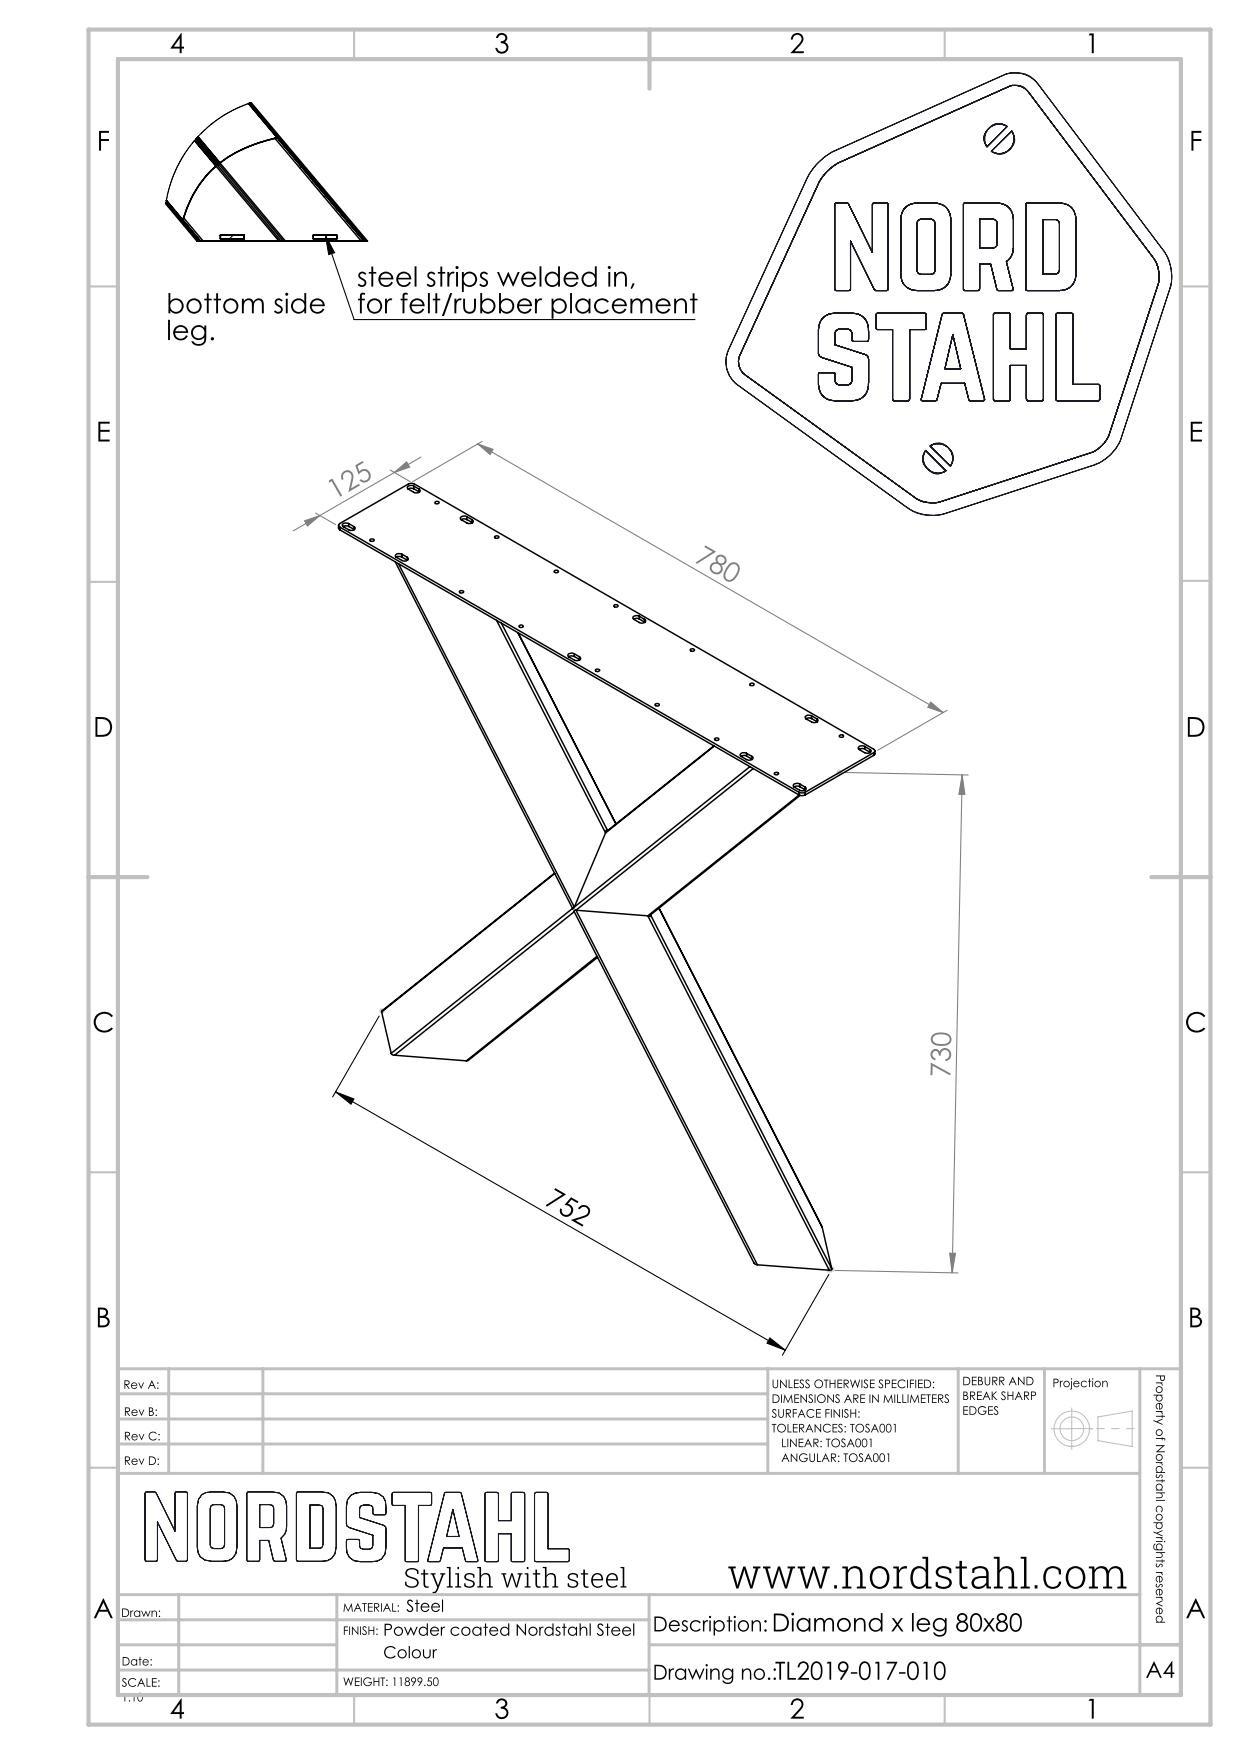 Nordstahl Diamond X leg-5